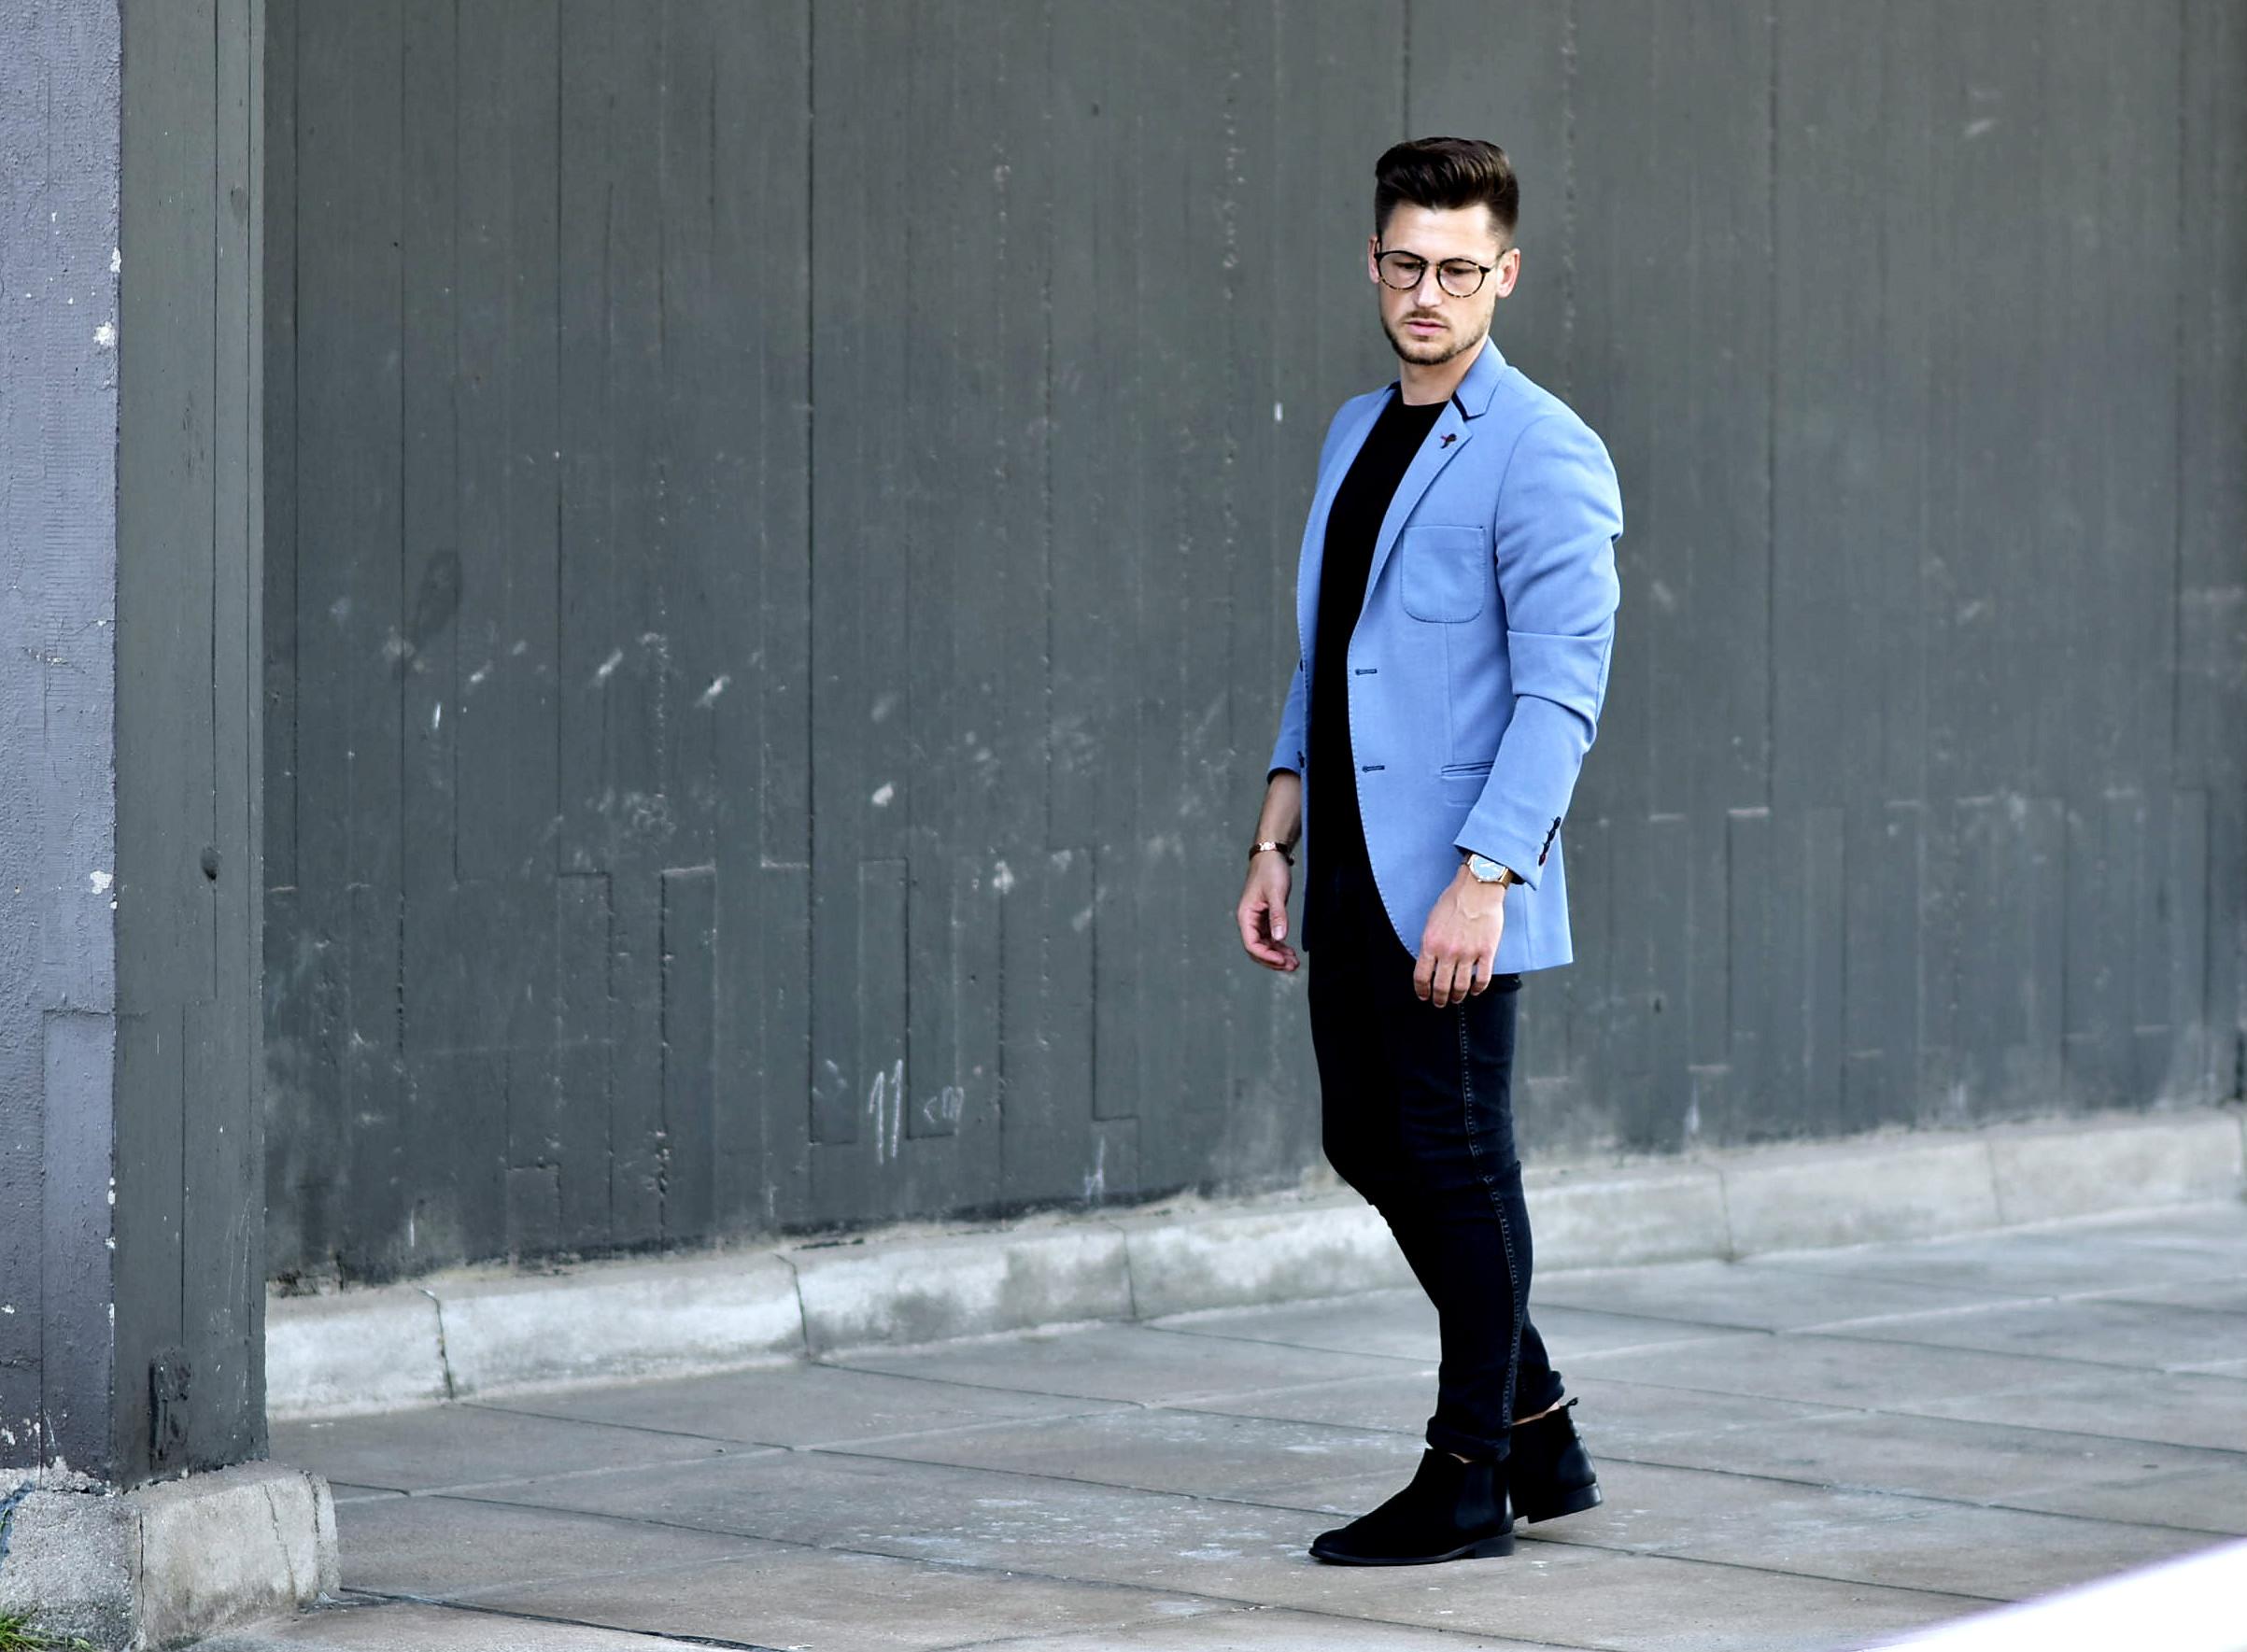 Tommeezjerry-Styleblog-Männerblog-Männer-Modeblog-Berlin-Berlinblog-Outfit-Streetlook-Royalblauer-Blazer-Royalblue-All-Black-Look-Chelsea-Boots-Skinny-Jeans-2